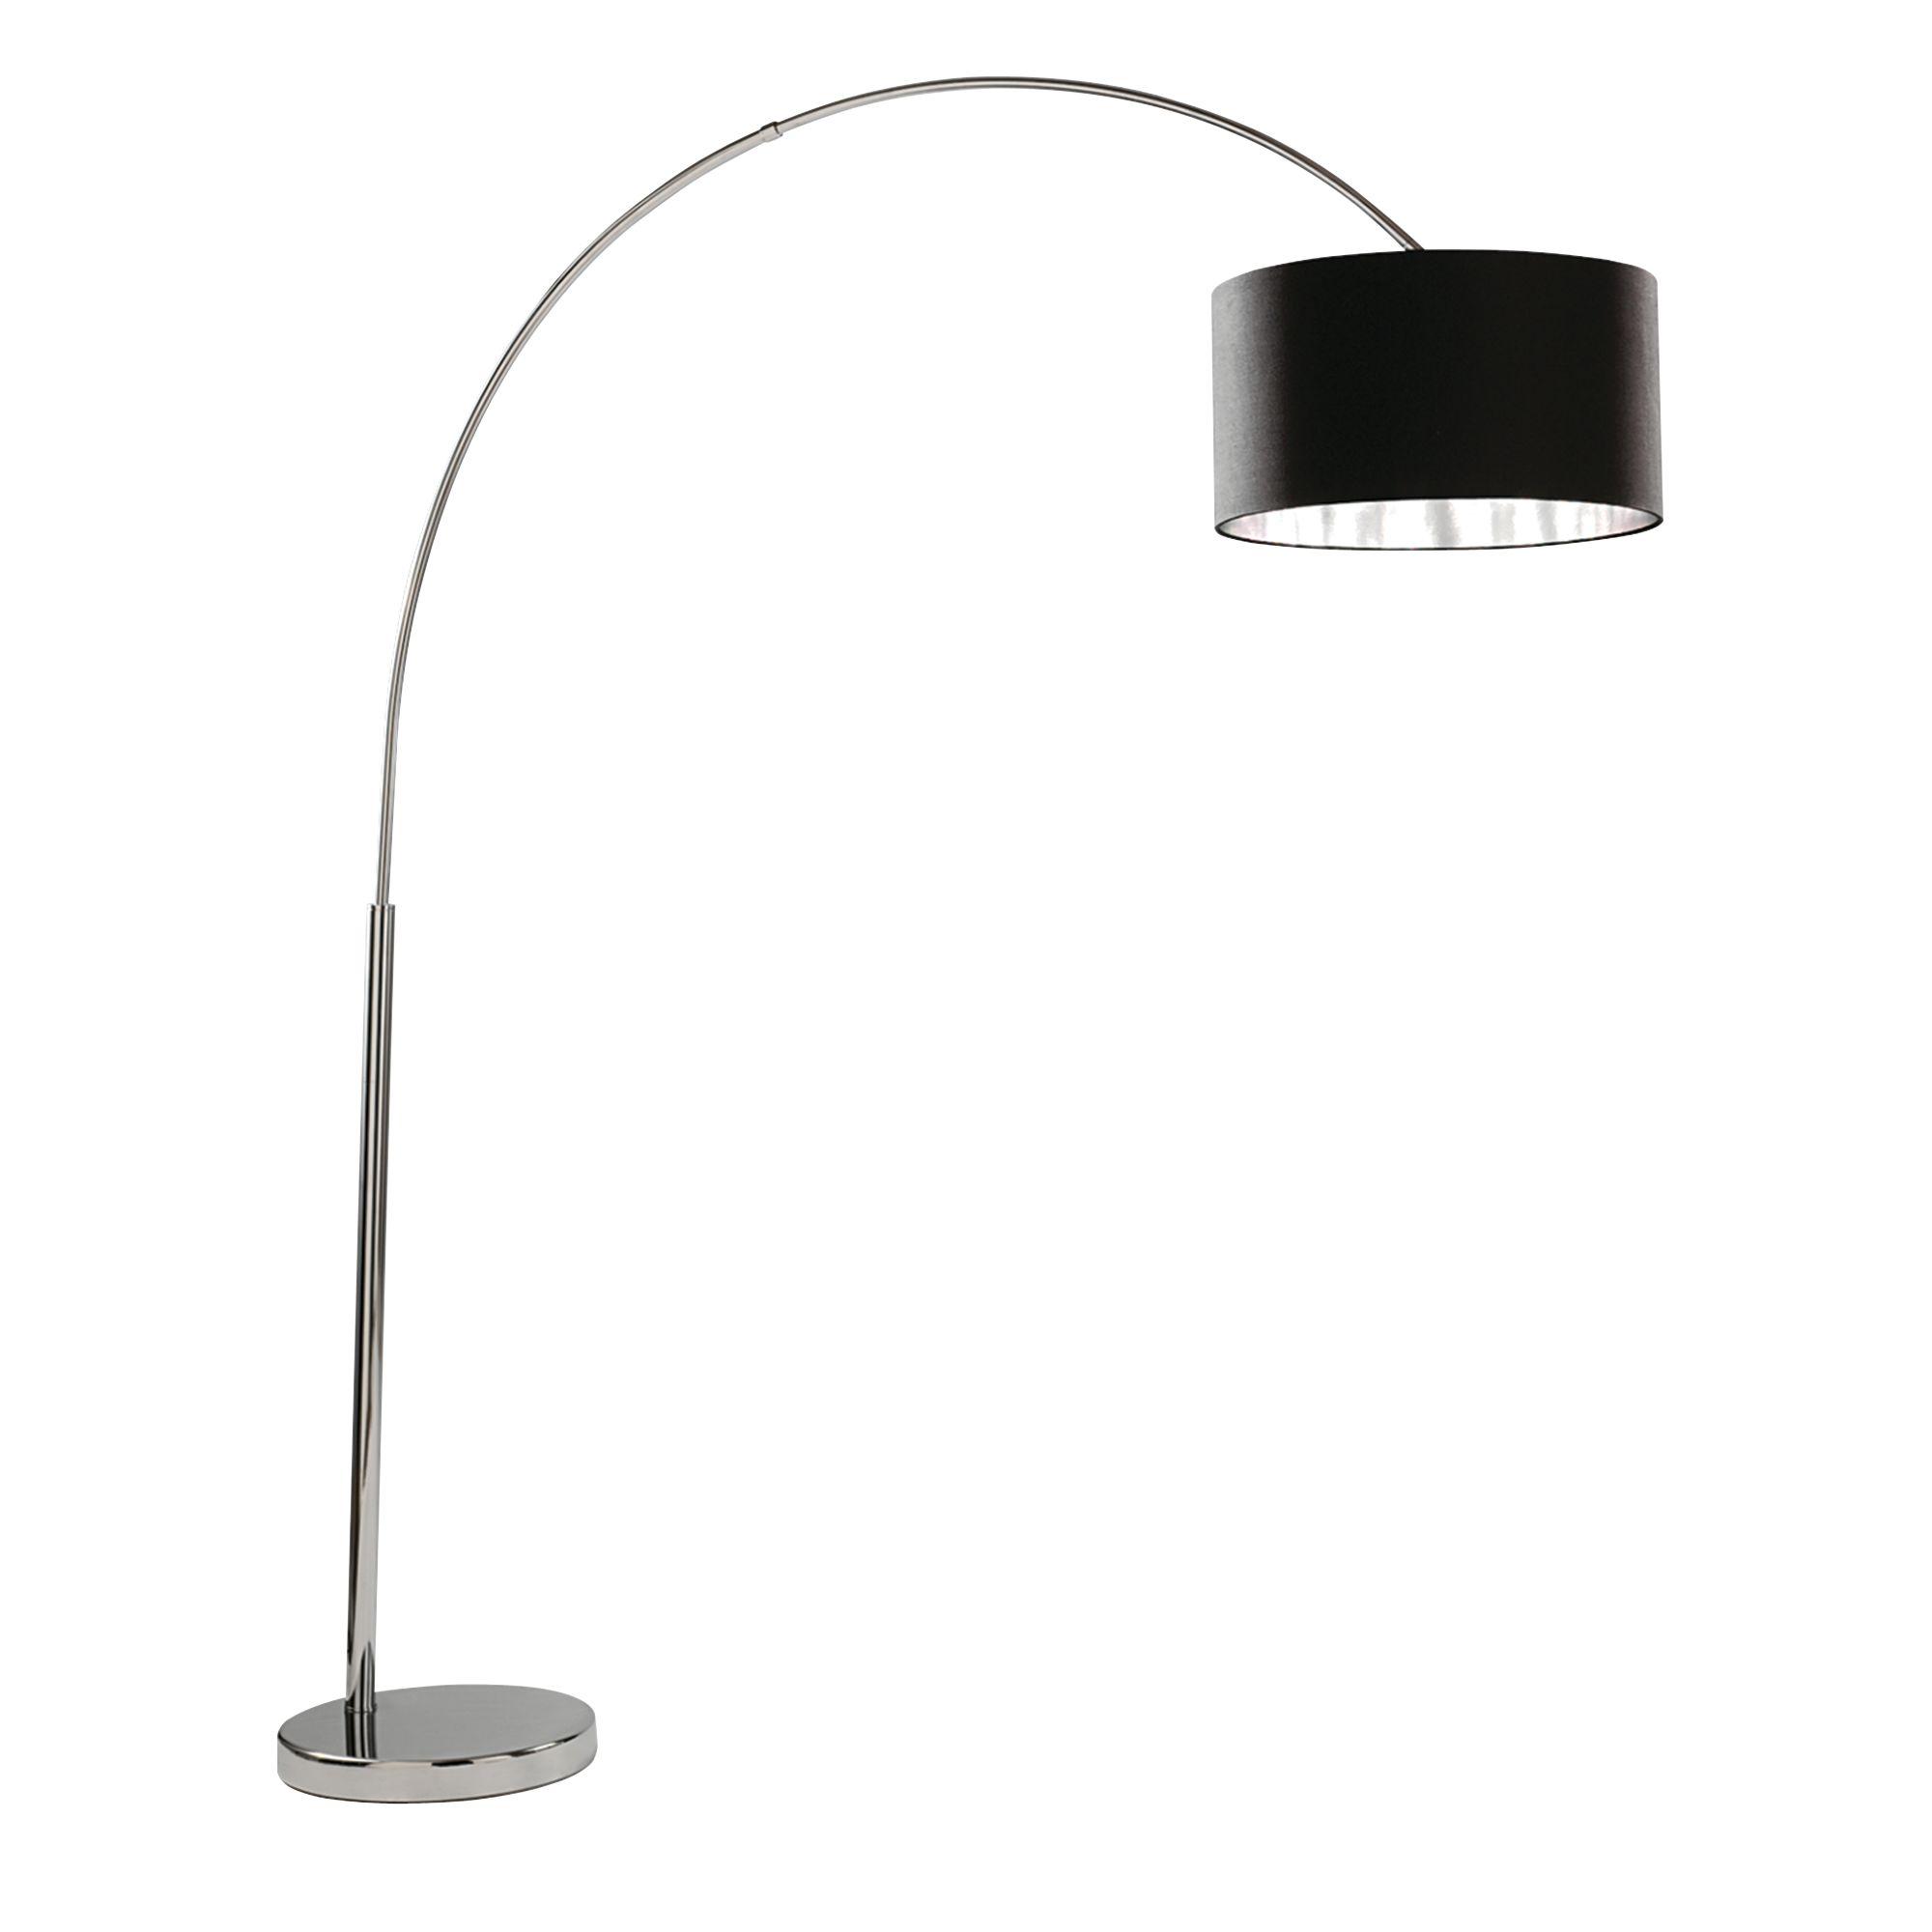 Arcs Chrome Floor Lamp With Black Fabric Shade & Silver Lining